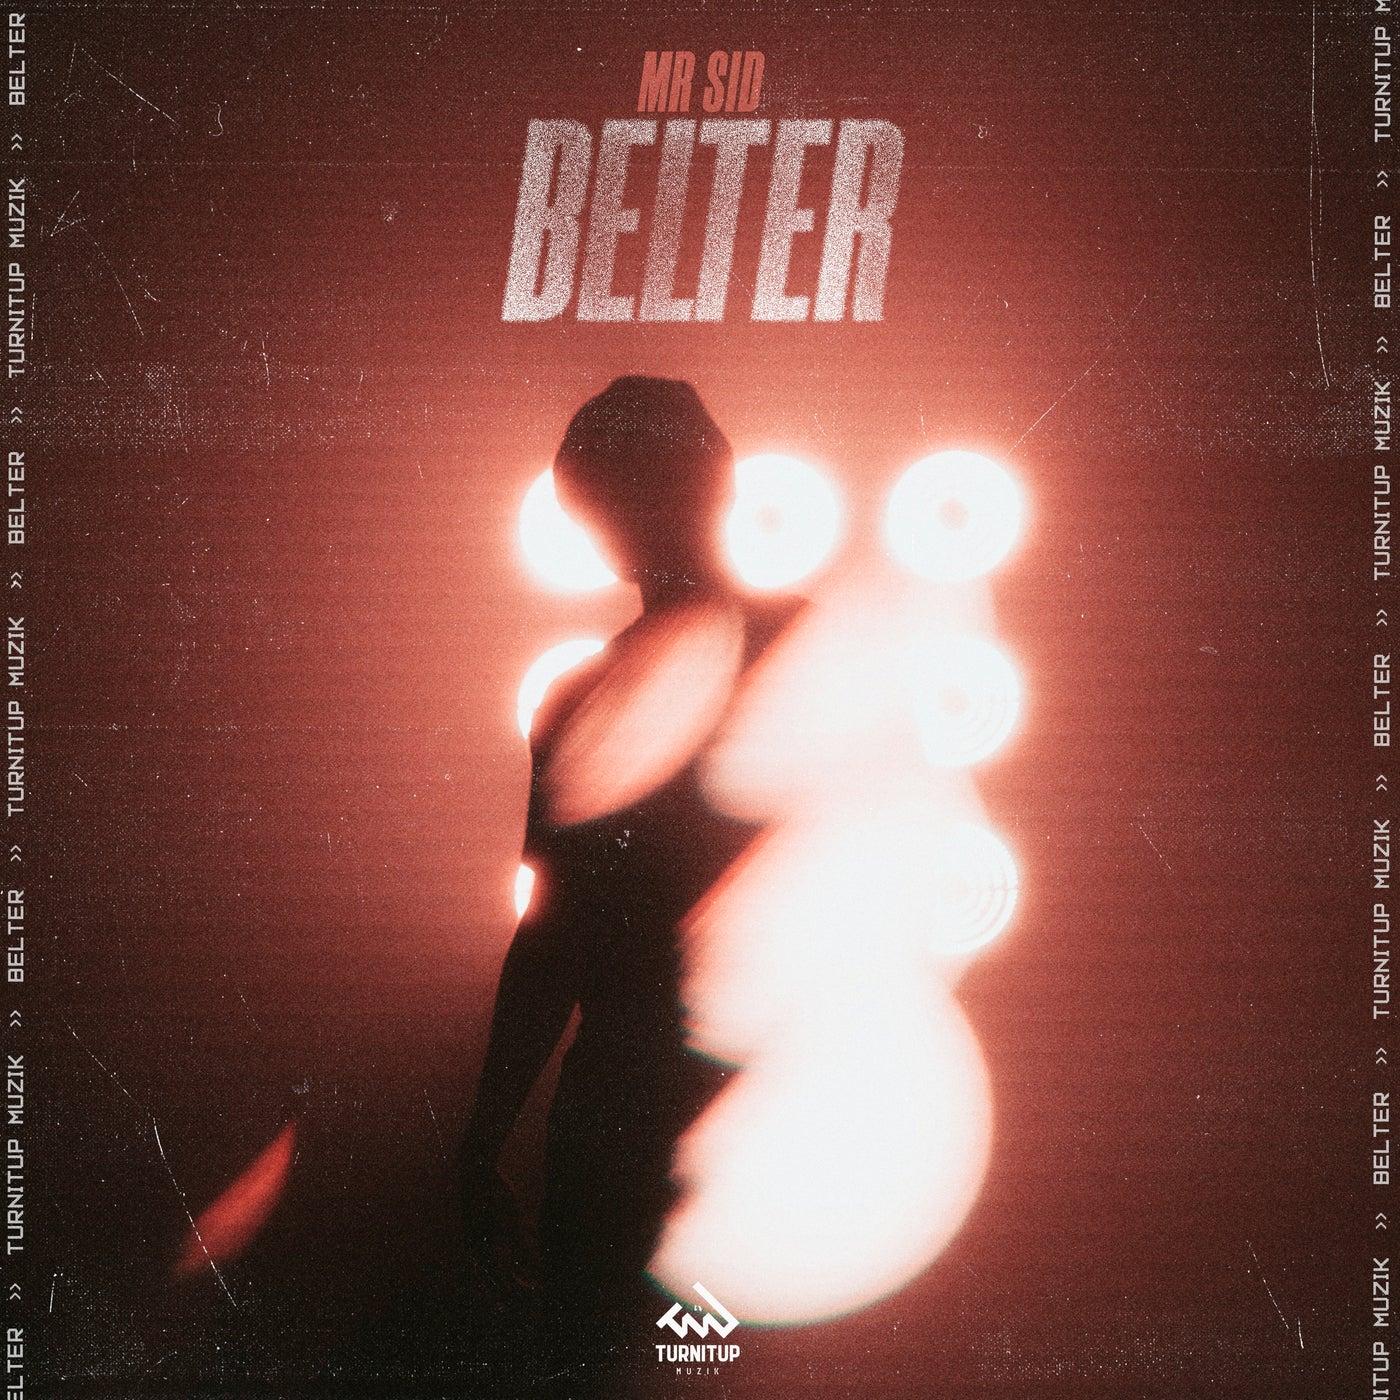 Belter (Club Mix)